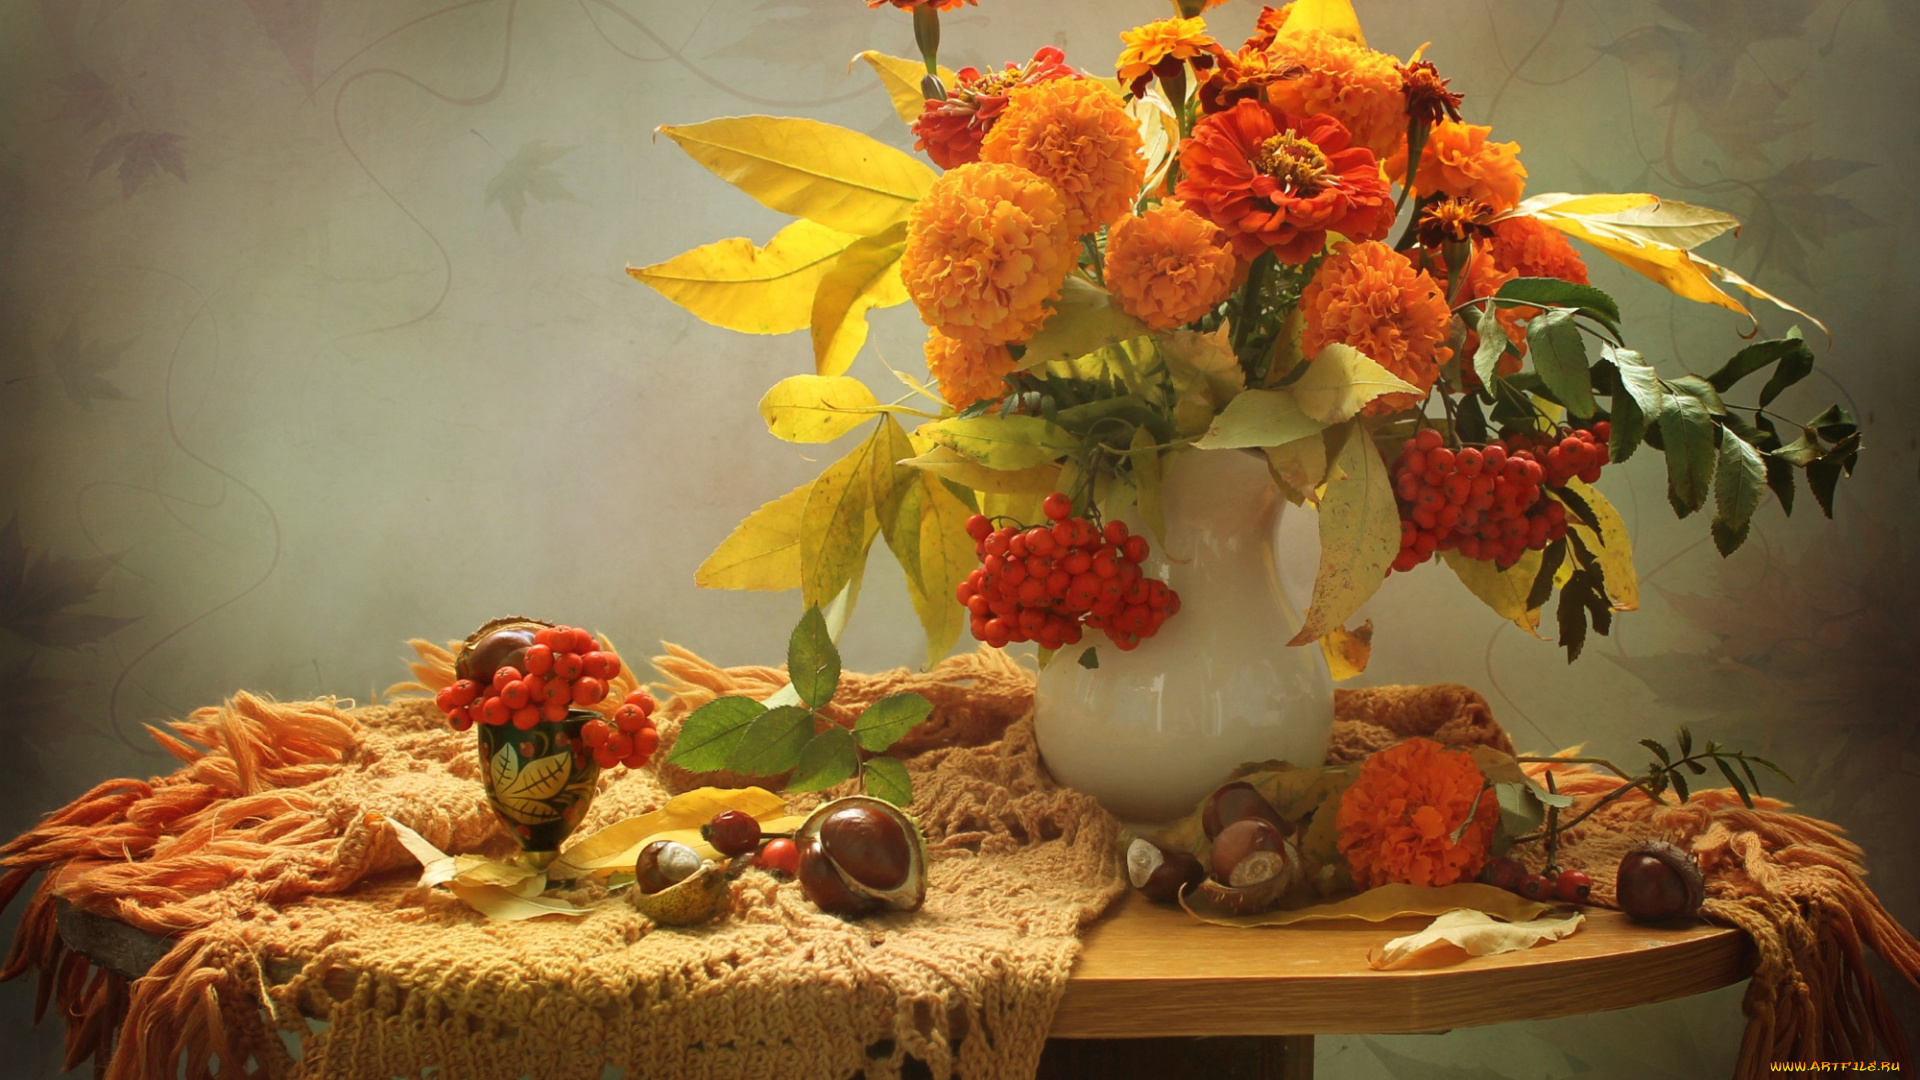 Осенний букетик картинки с добрым утром